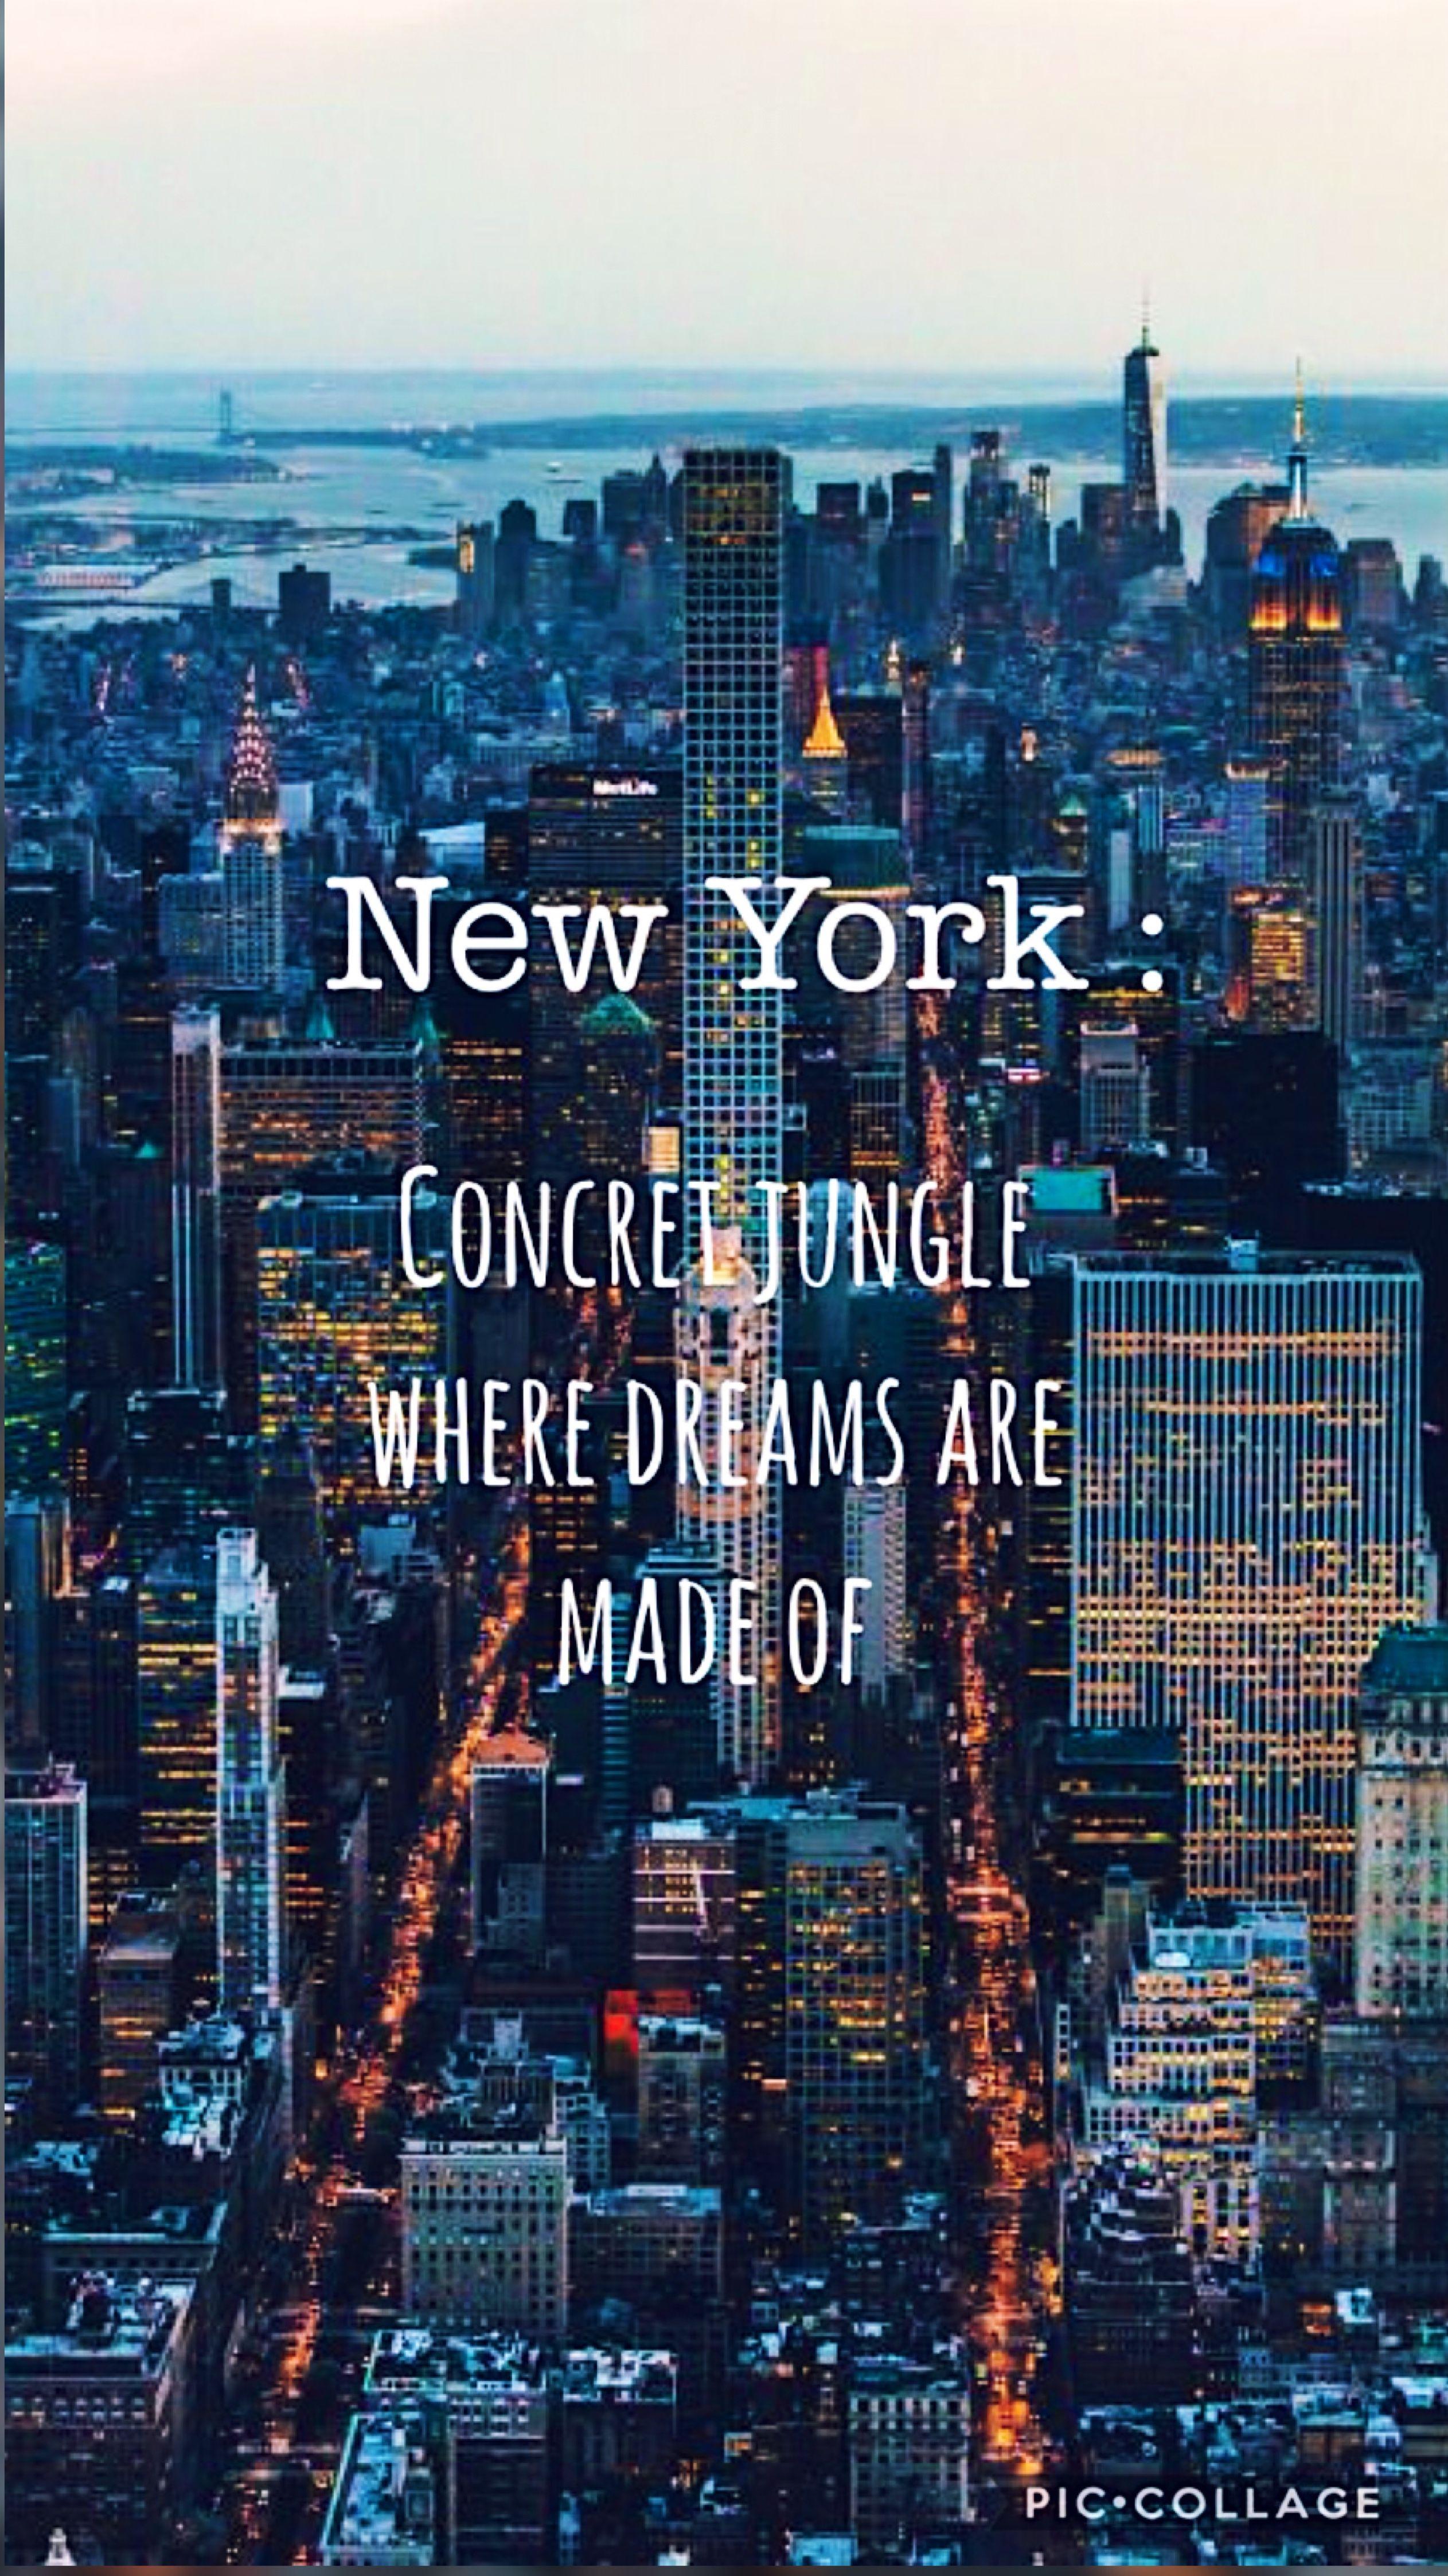 New York Alicia Keys Nyc Wallpaper New York Wallpaper New York Quotes New York City Photos